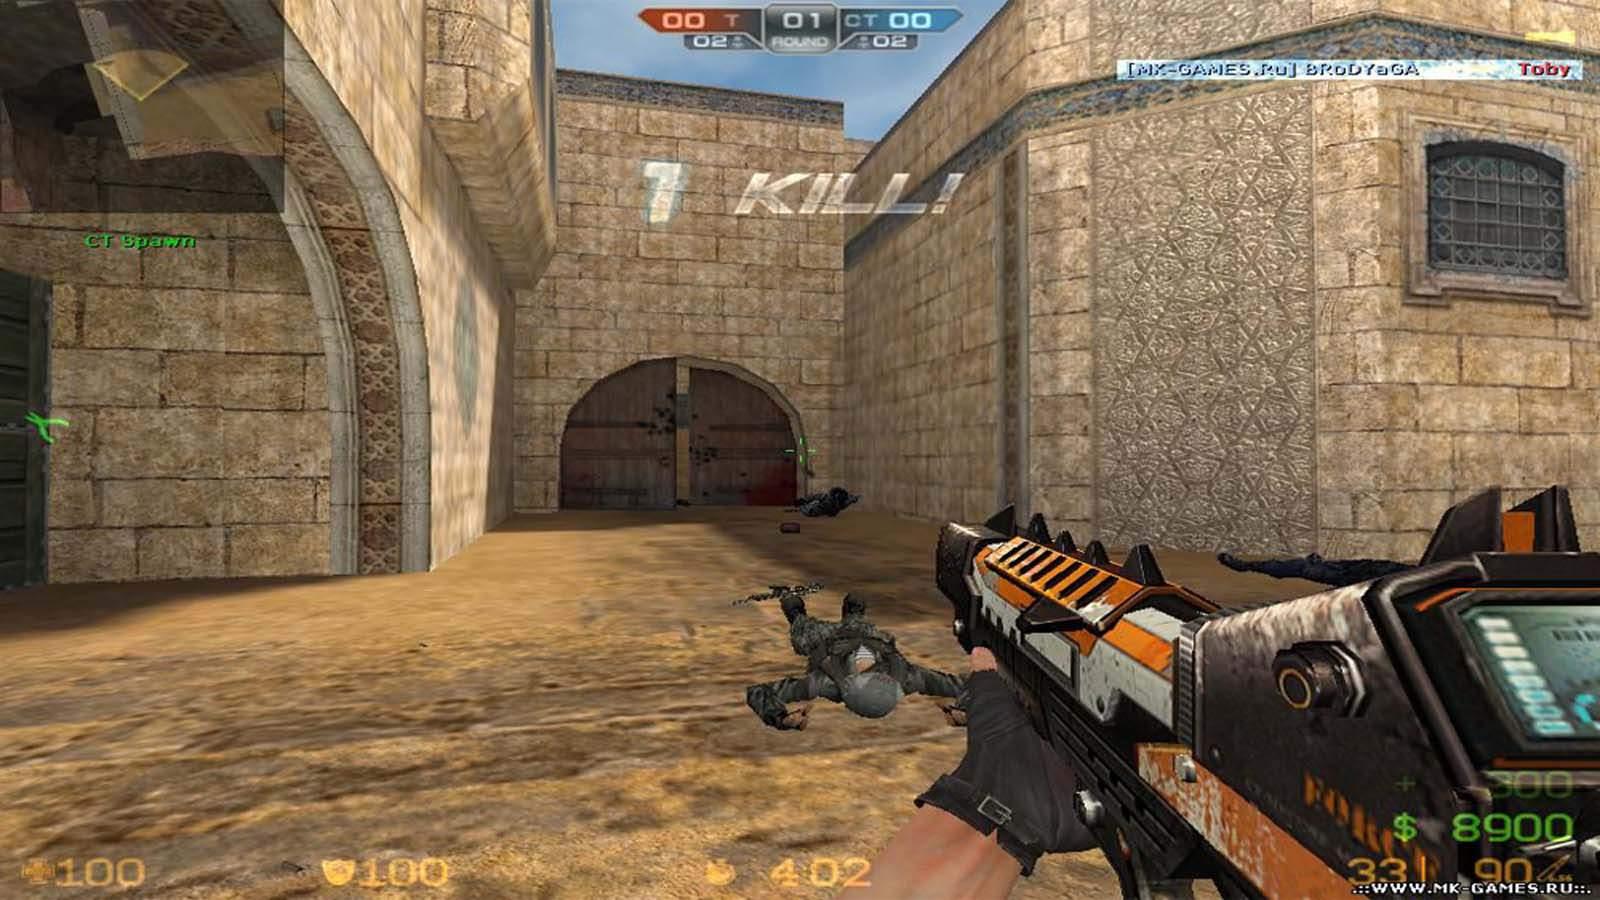 تحميل لعبة Counter Strike Extreme V7 مضغوطة برابط واحد مباشر كاملة مجانا